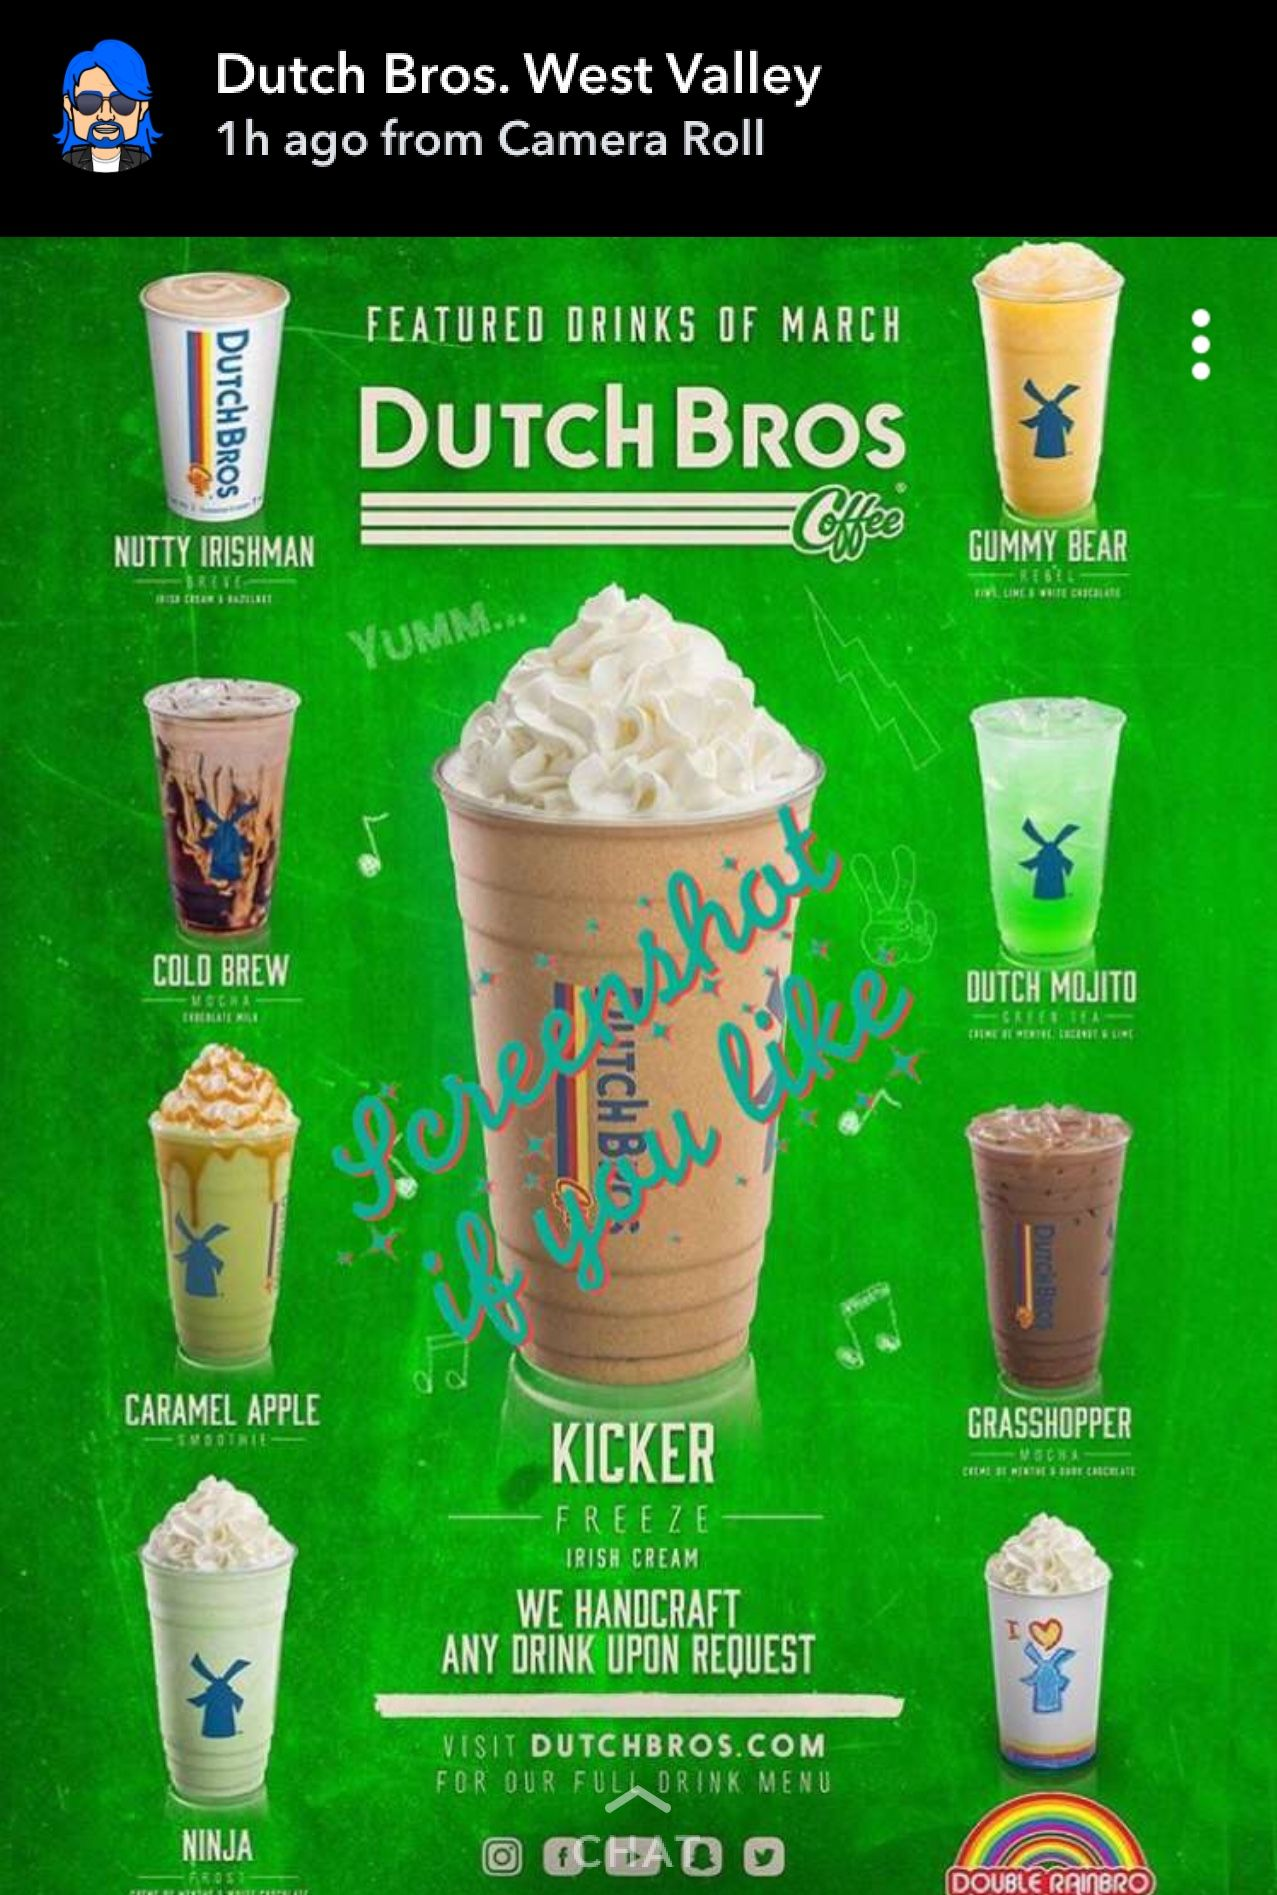 Pin By Stephanie Santana On Dutchbros Dutch Bros Drinks Dutch Bros Dutch Bros Secret Menu